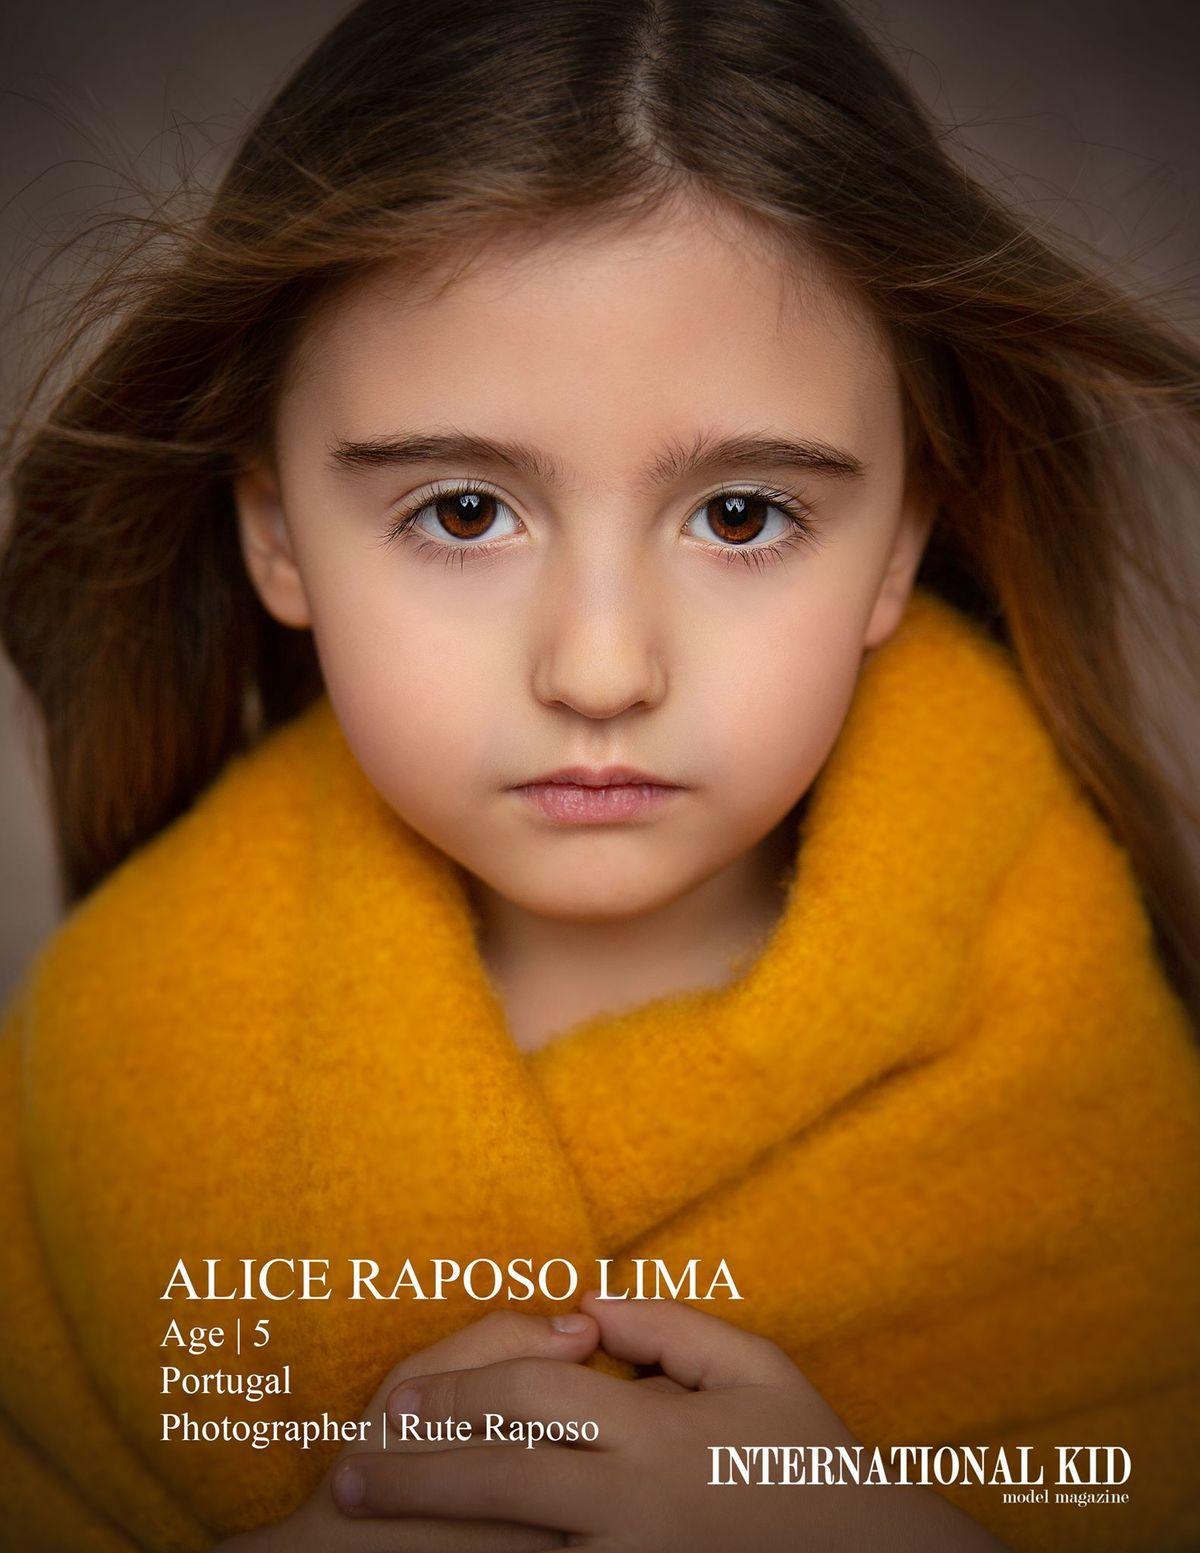 Imagem capa - Destaque na International Kid Model Magazine por Rute Raposo